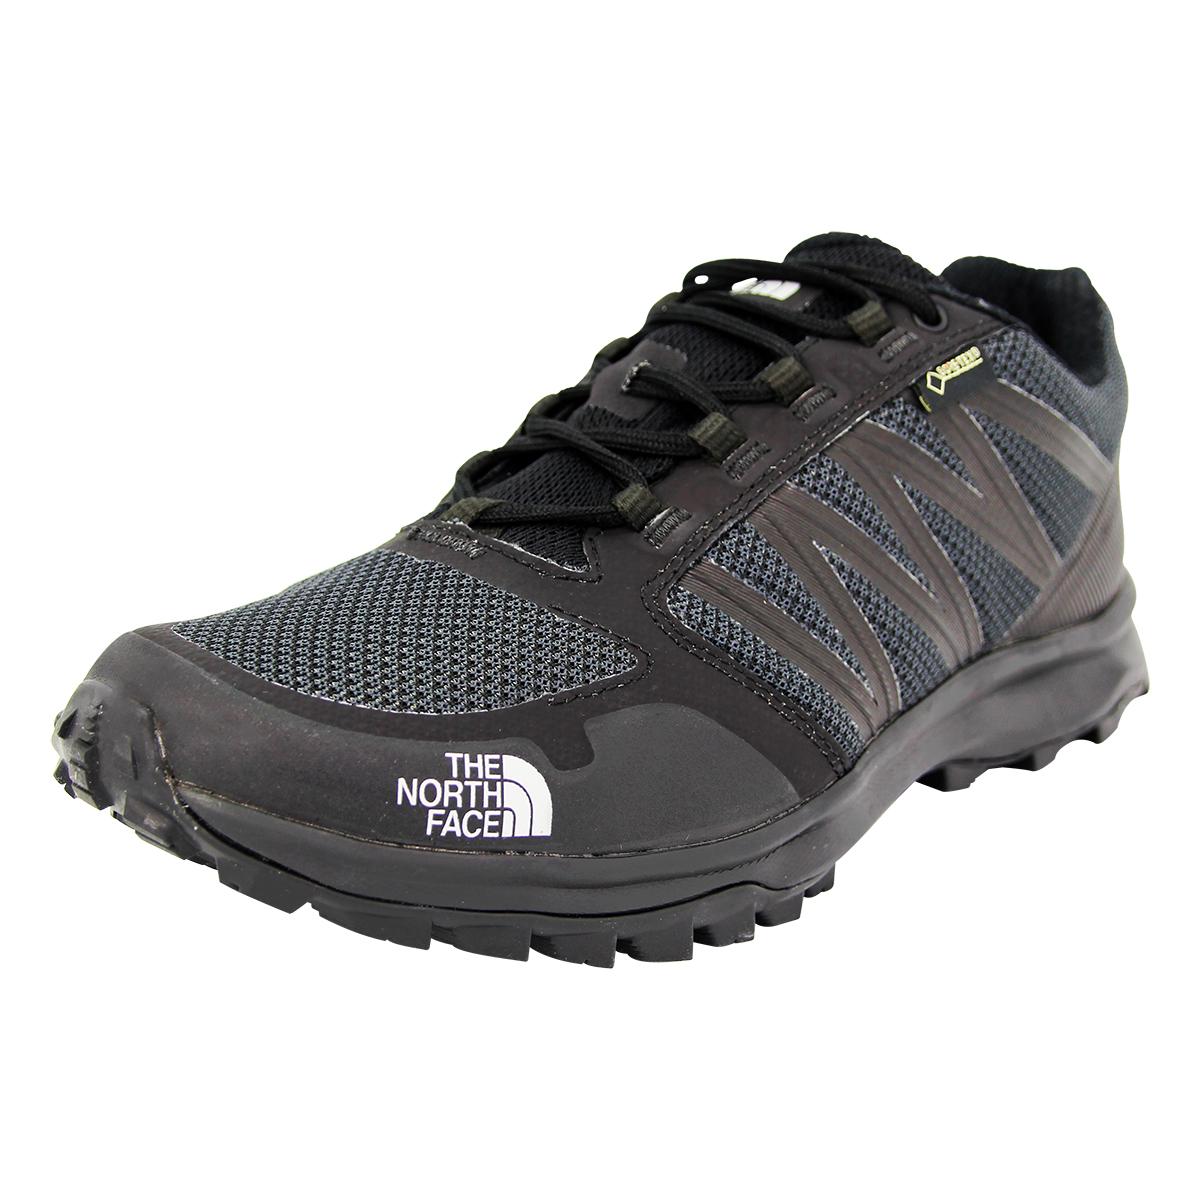 The North Face M LITEWAVE FP GORETEX shoes da trekking men GORETEX